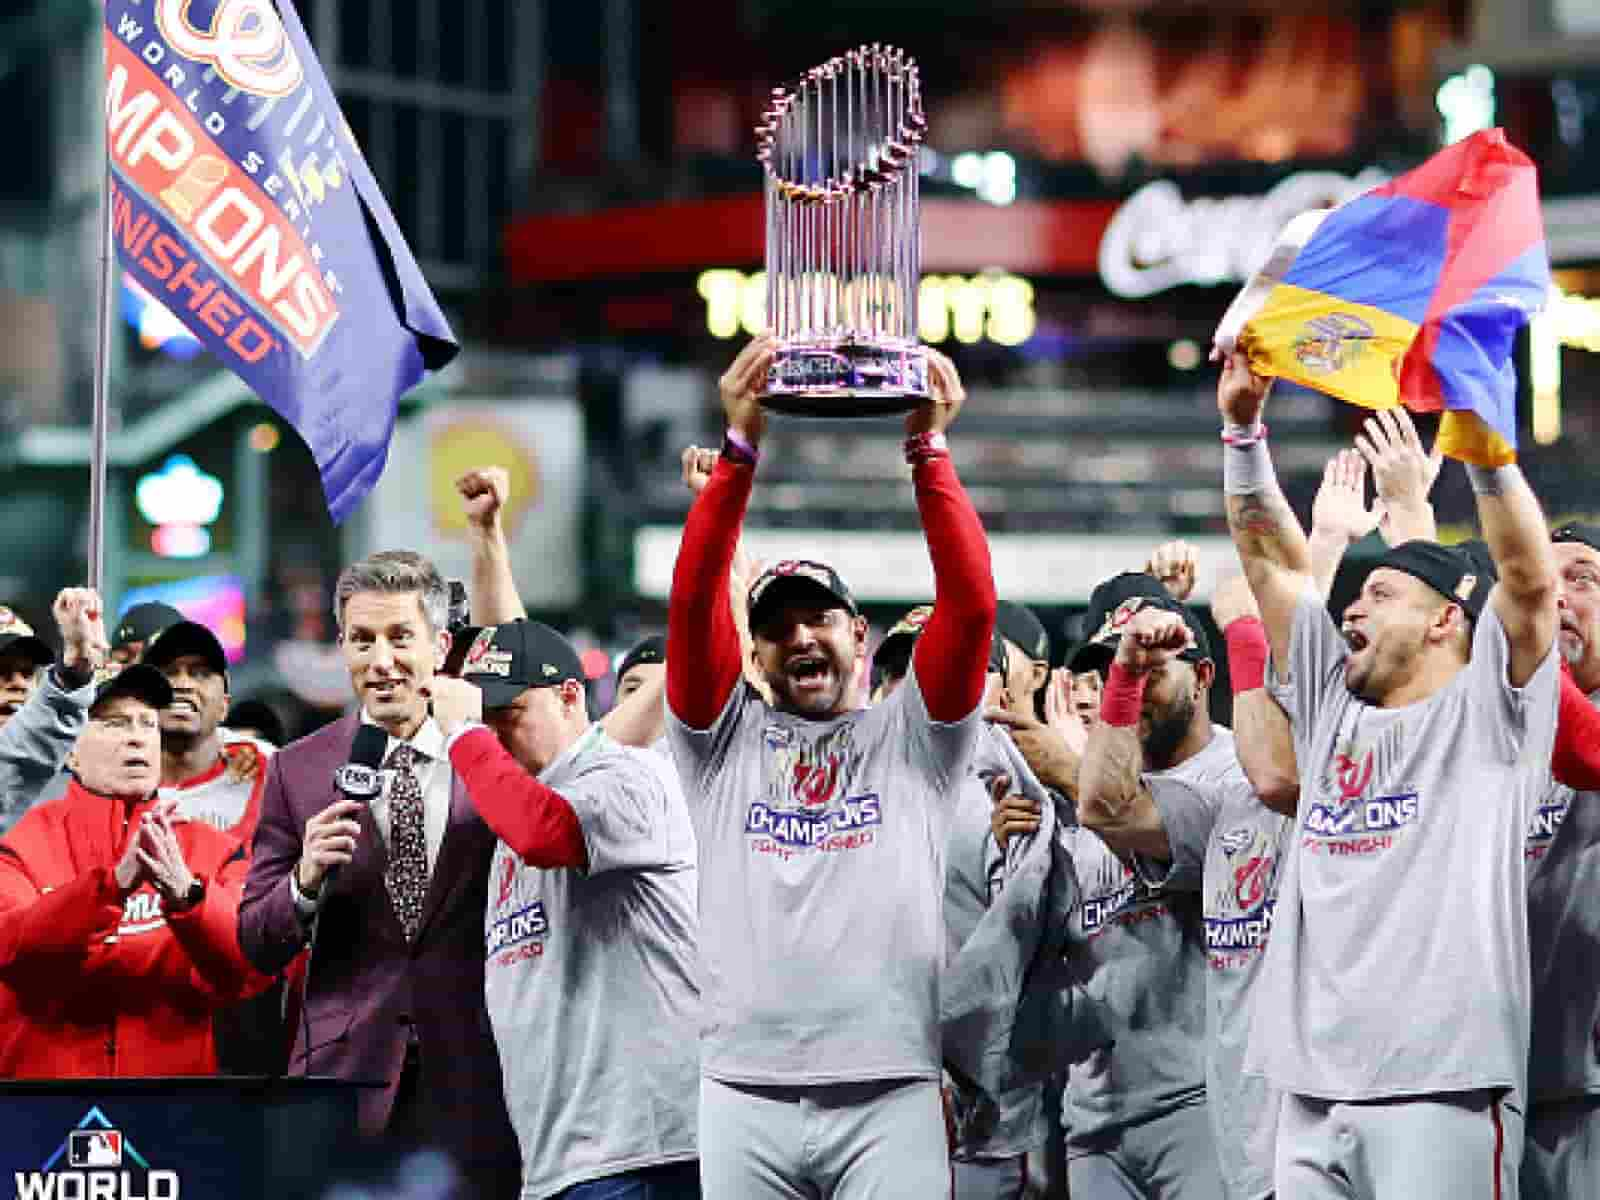 Washington Nationals World Series Champs 2019